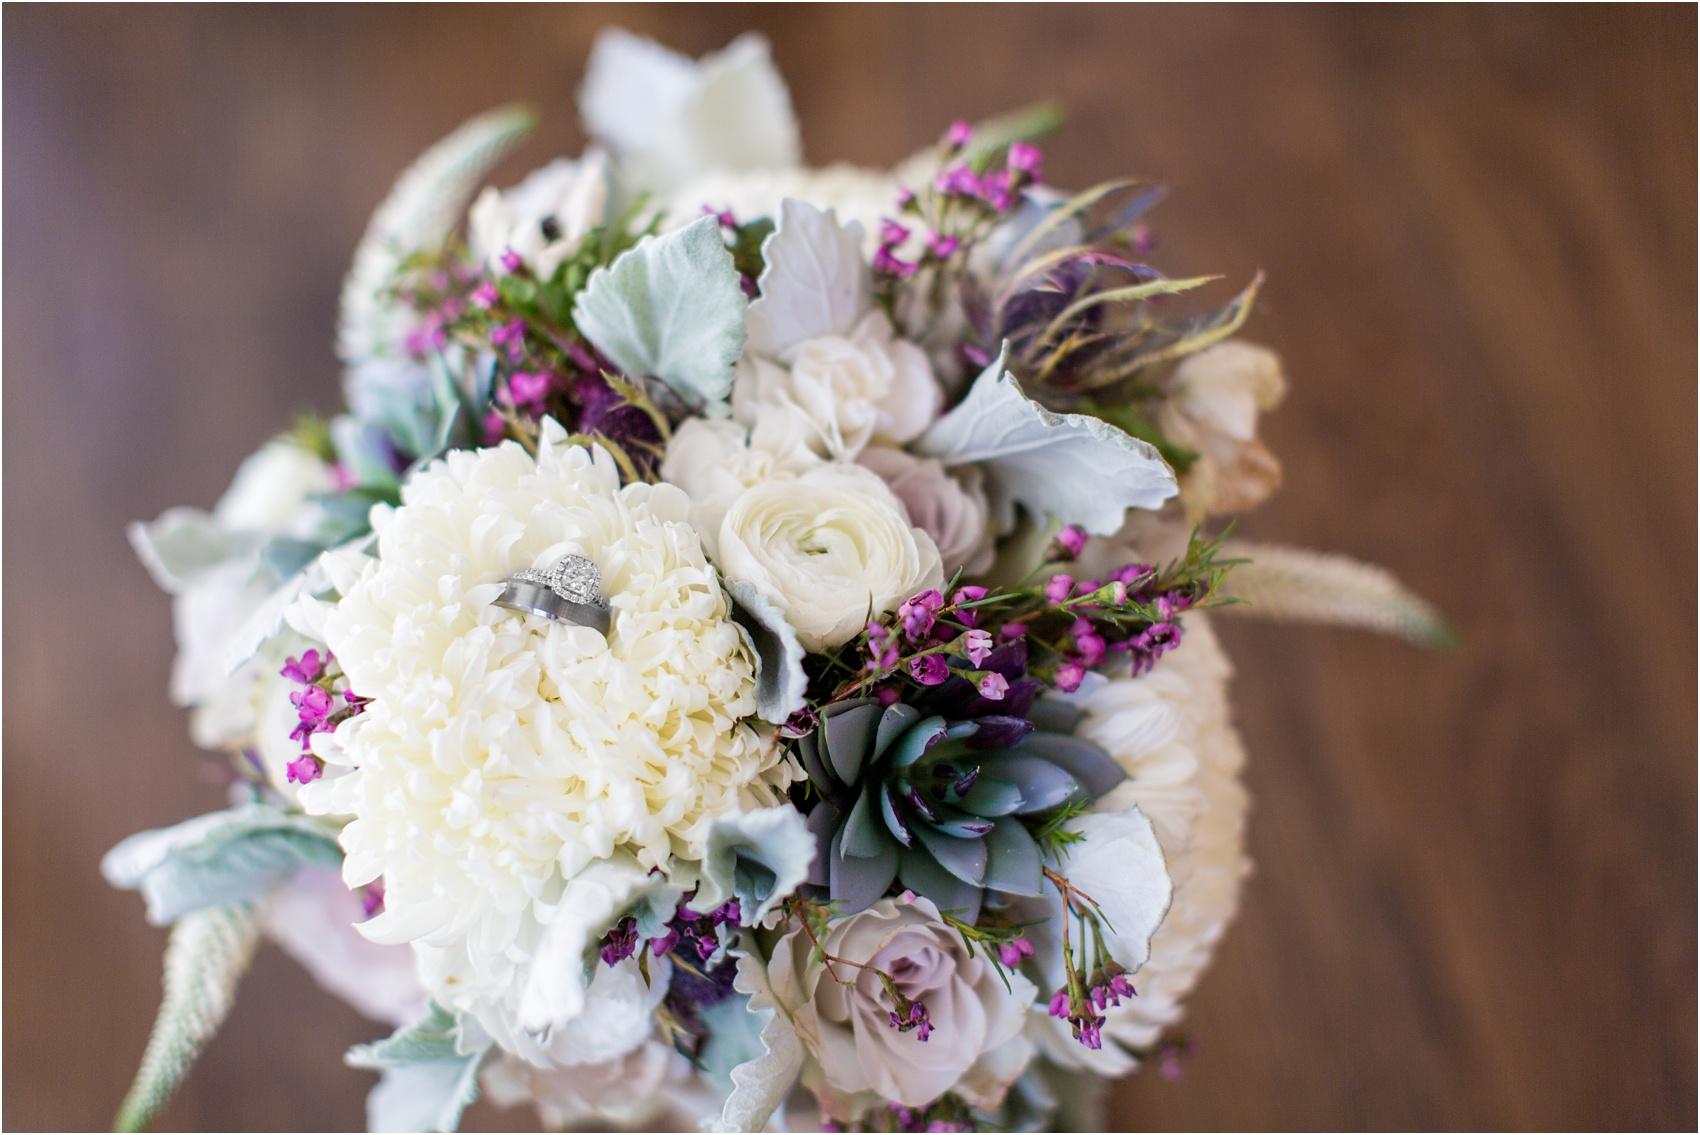 Savannah Eve Photography- Perkins Wedding- Blog-4.jpg